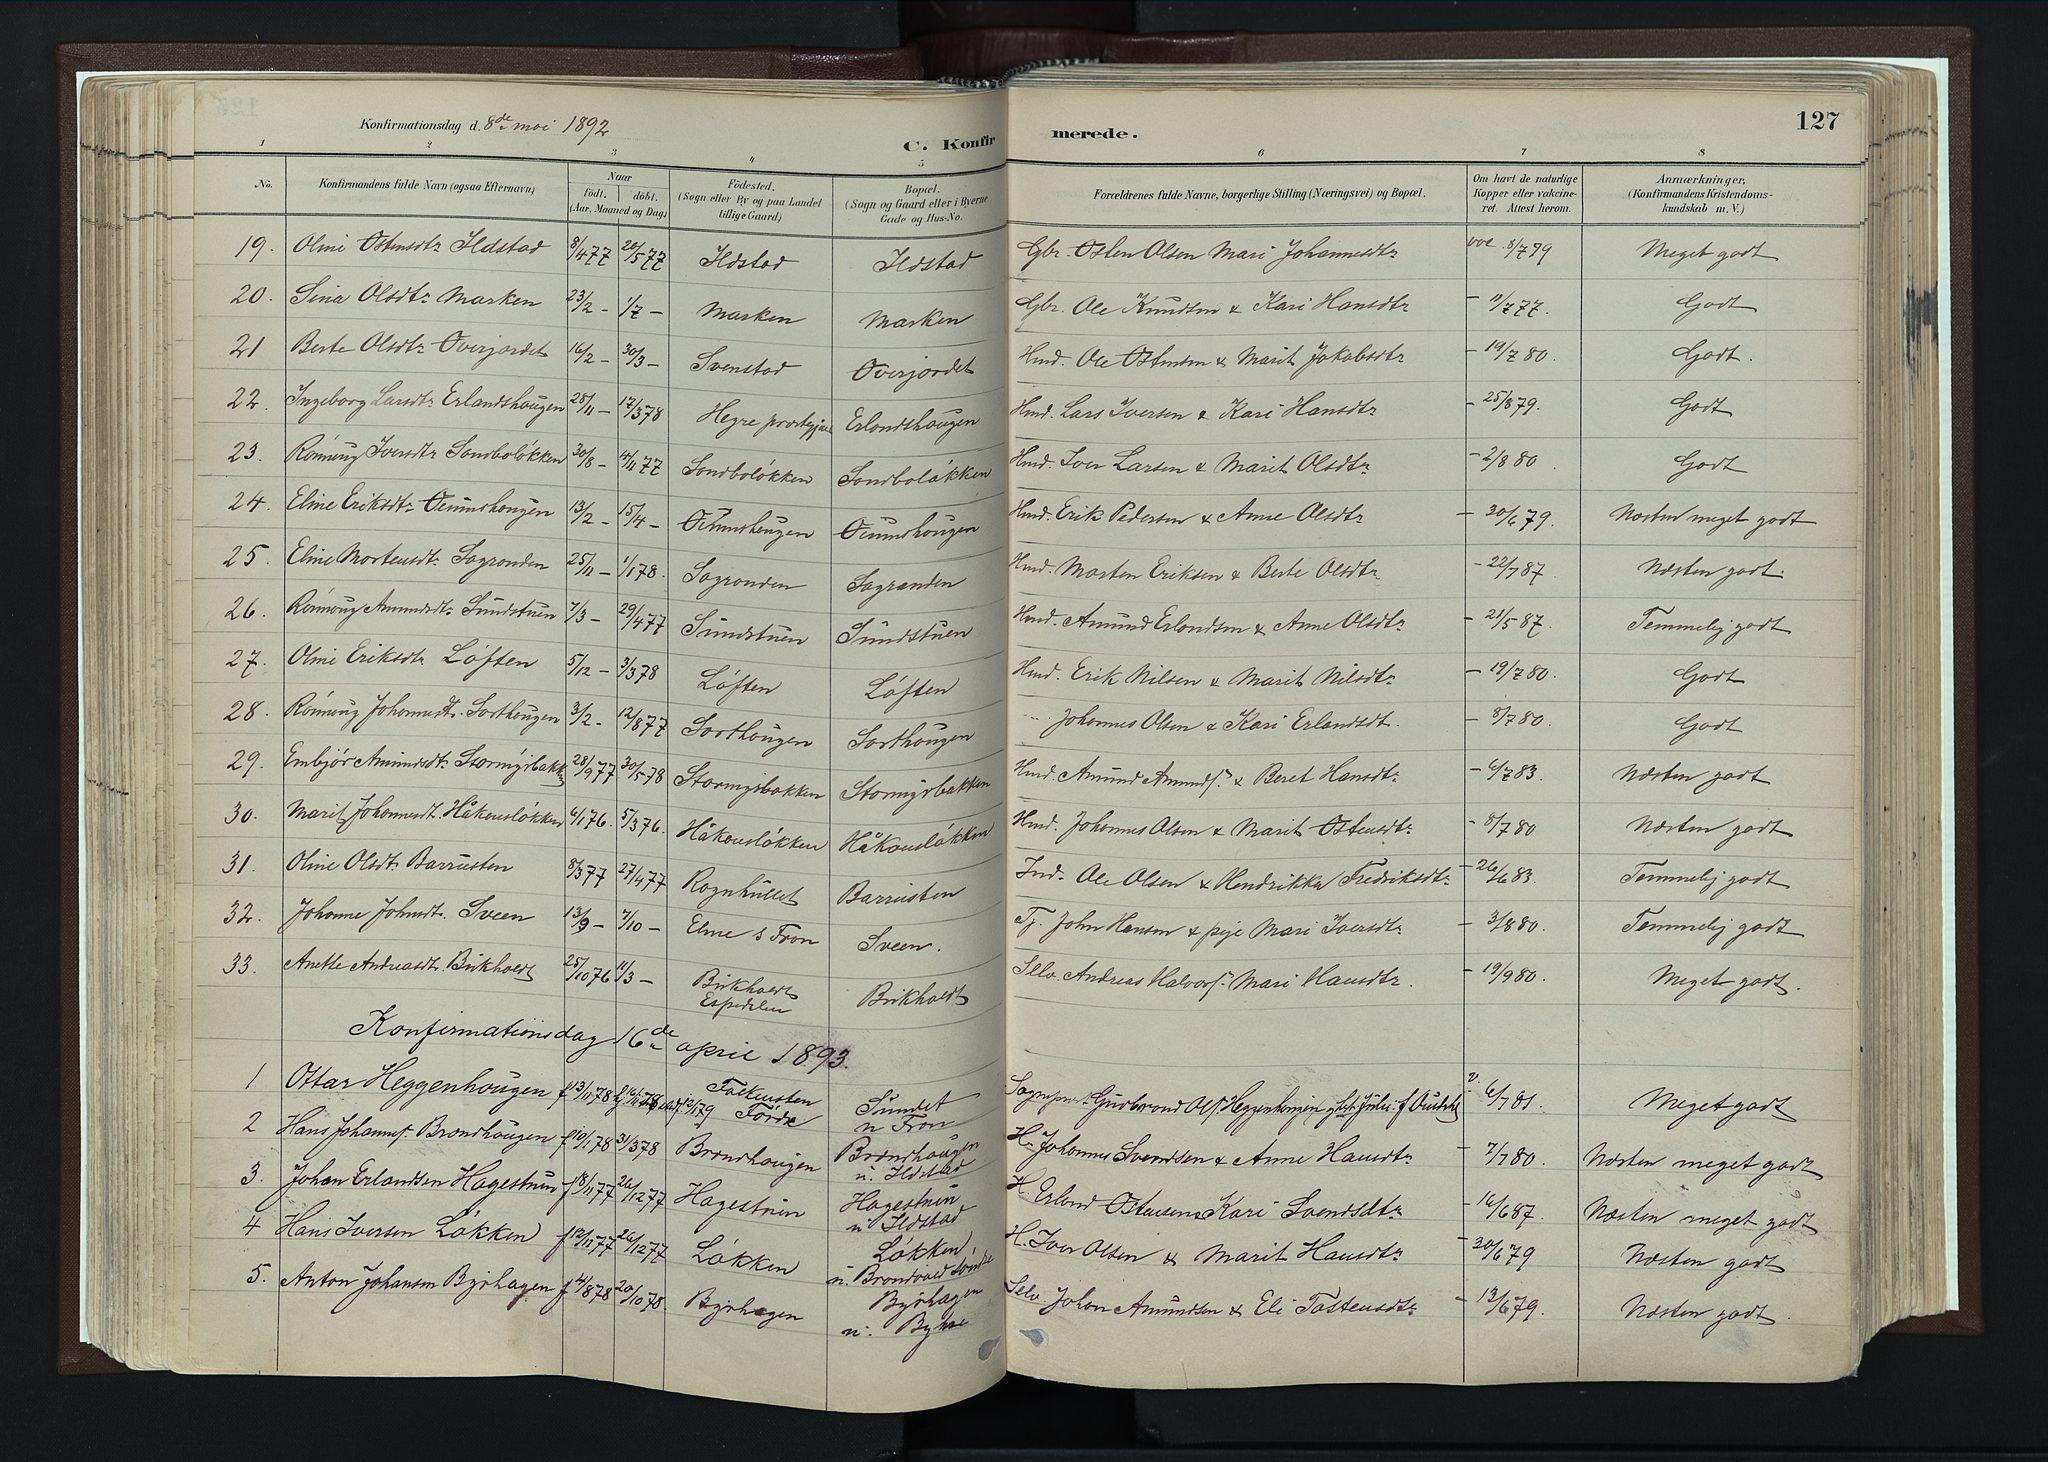 SAH, Nord-Fron prestekontor, Ministerialbok nr. 4, 1884-1914, s. 127